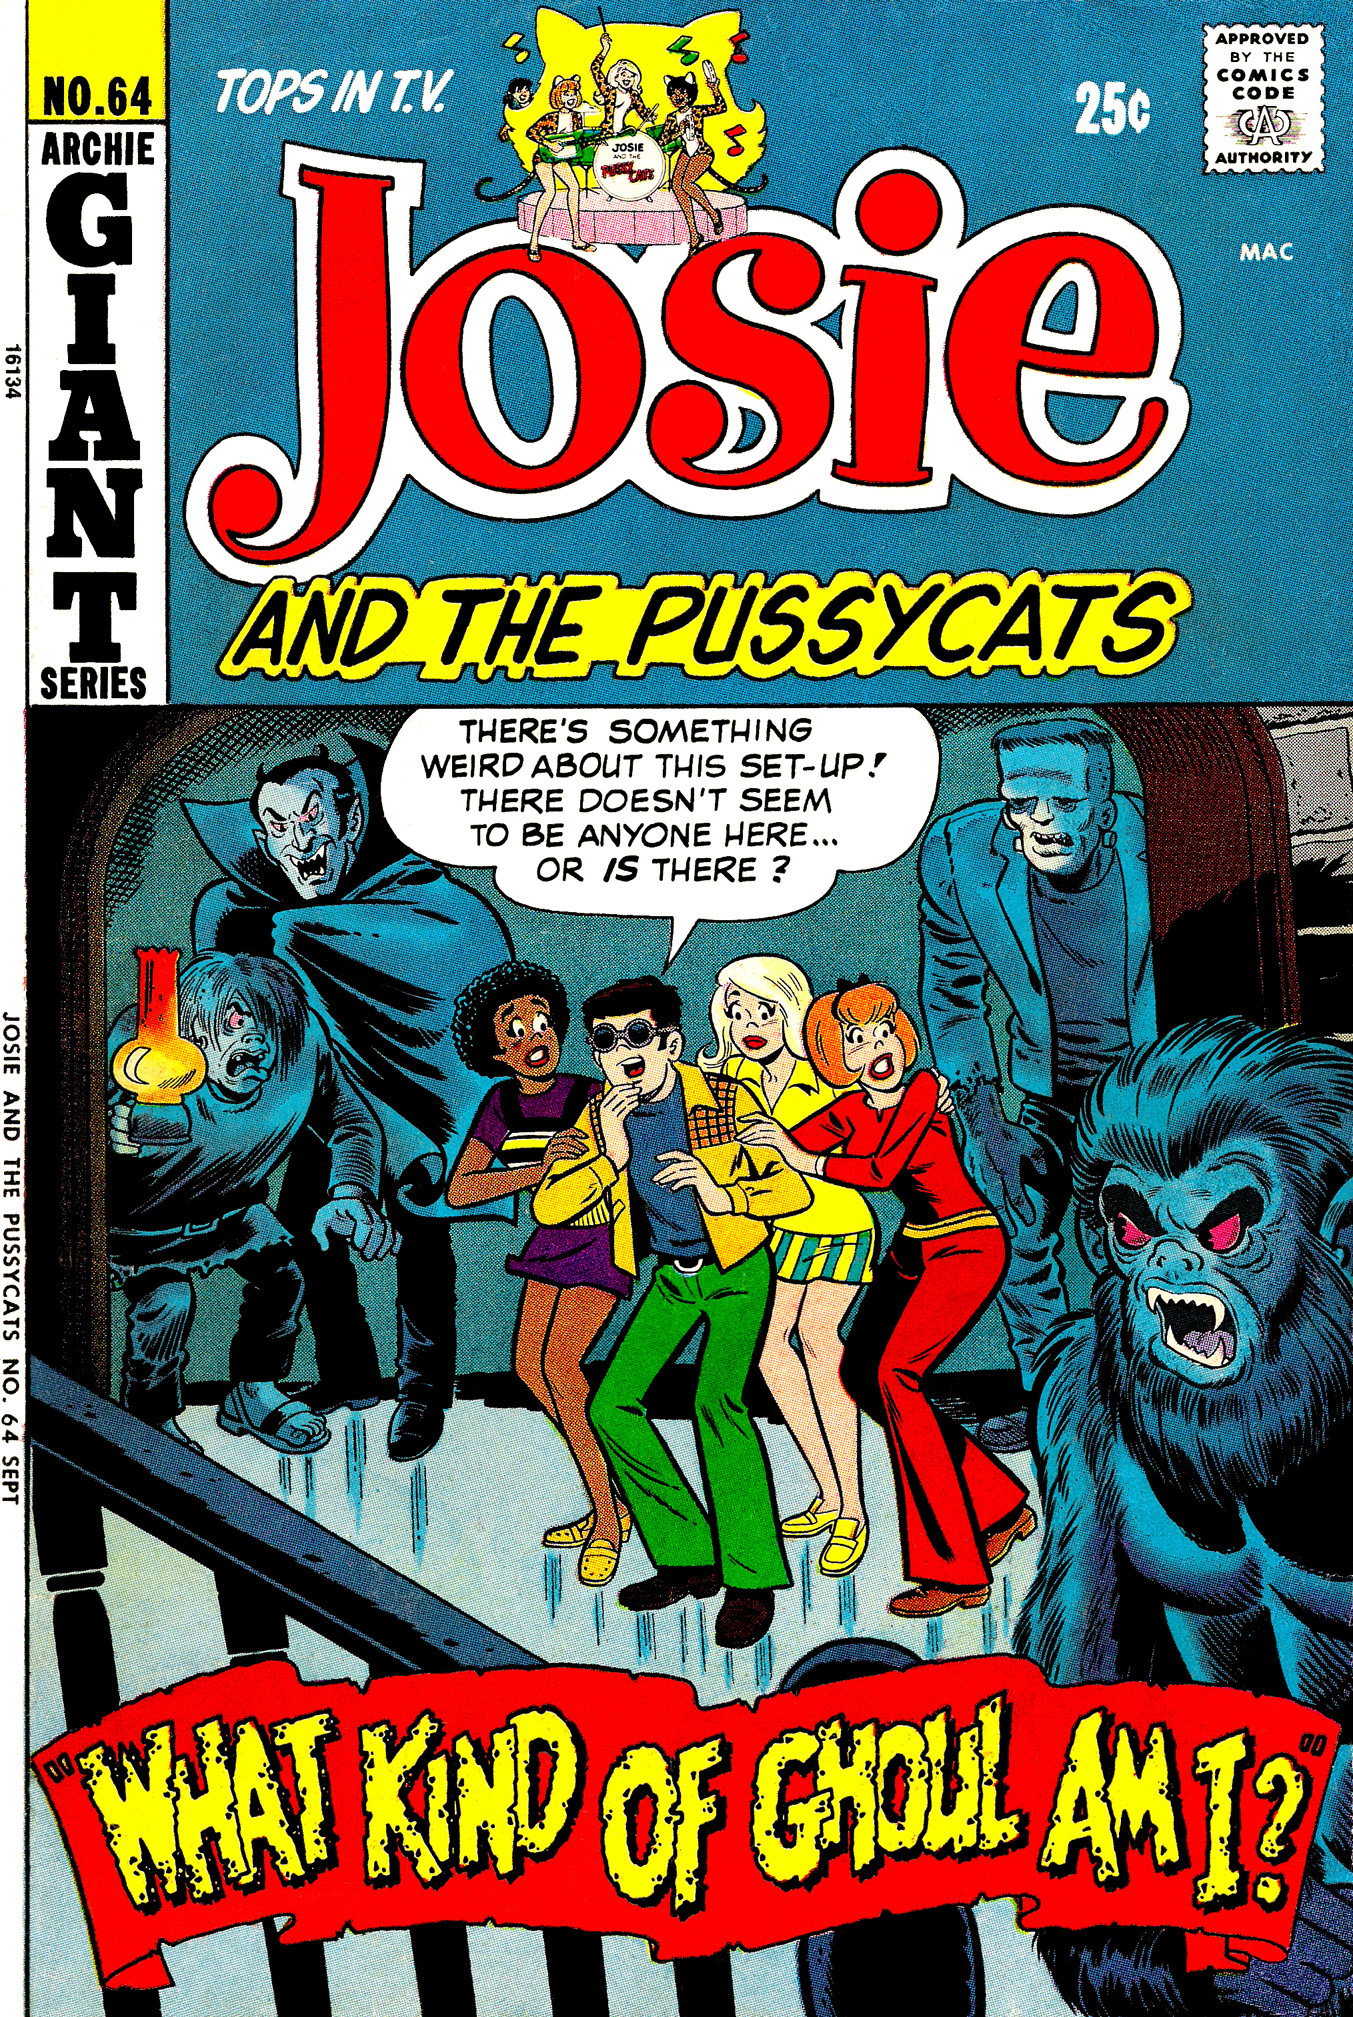 Read online She's Josie comic -  Issue #64 - 1